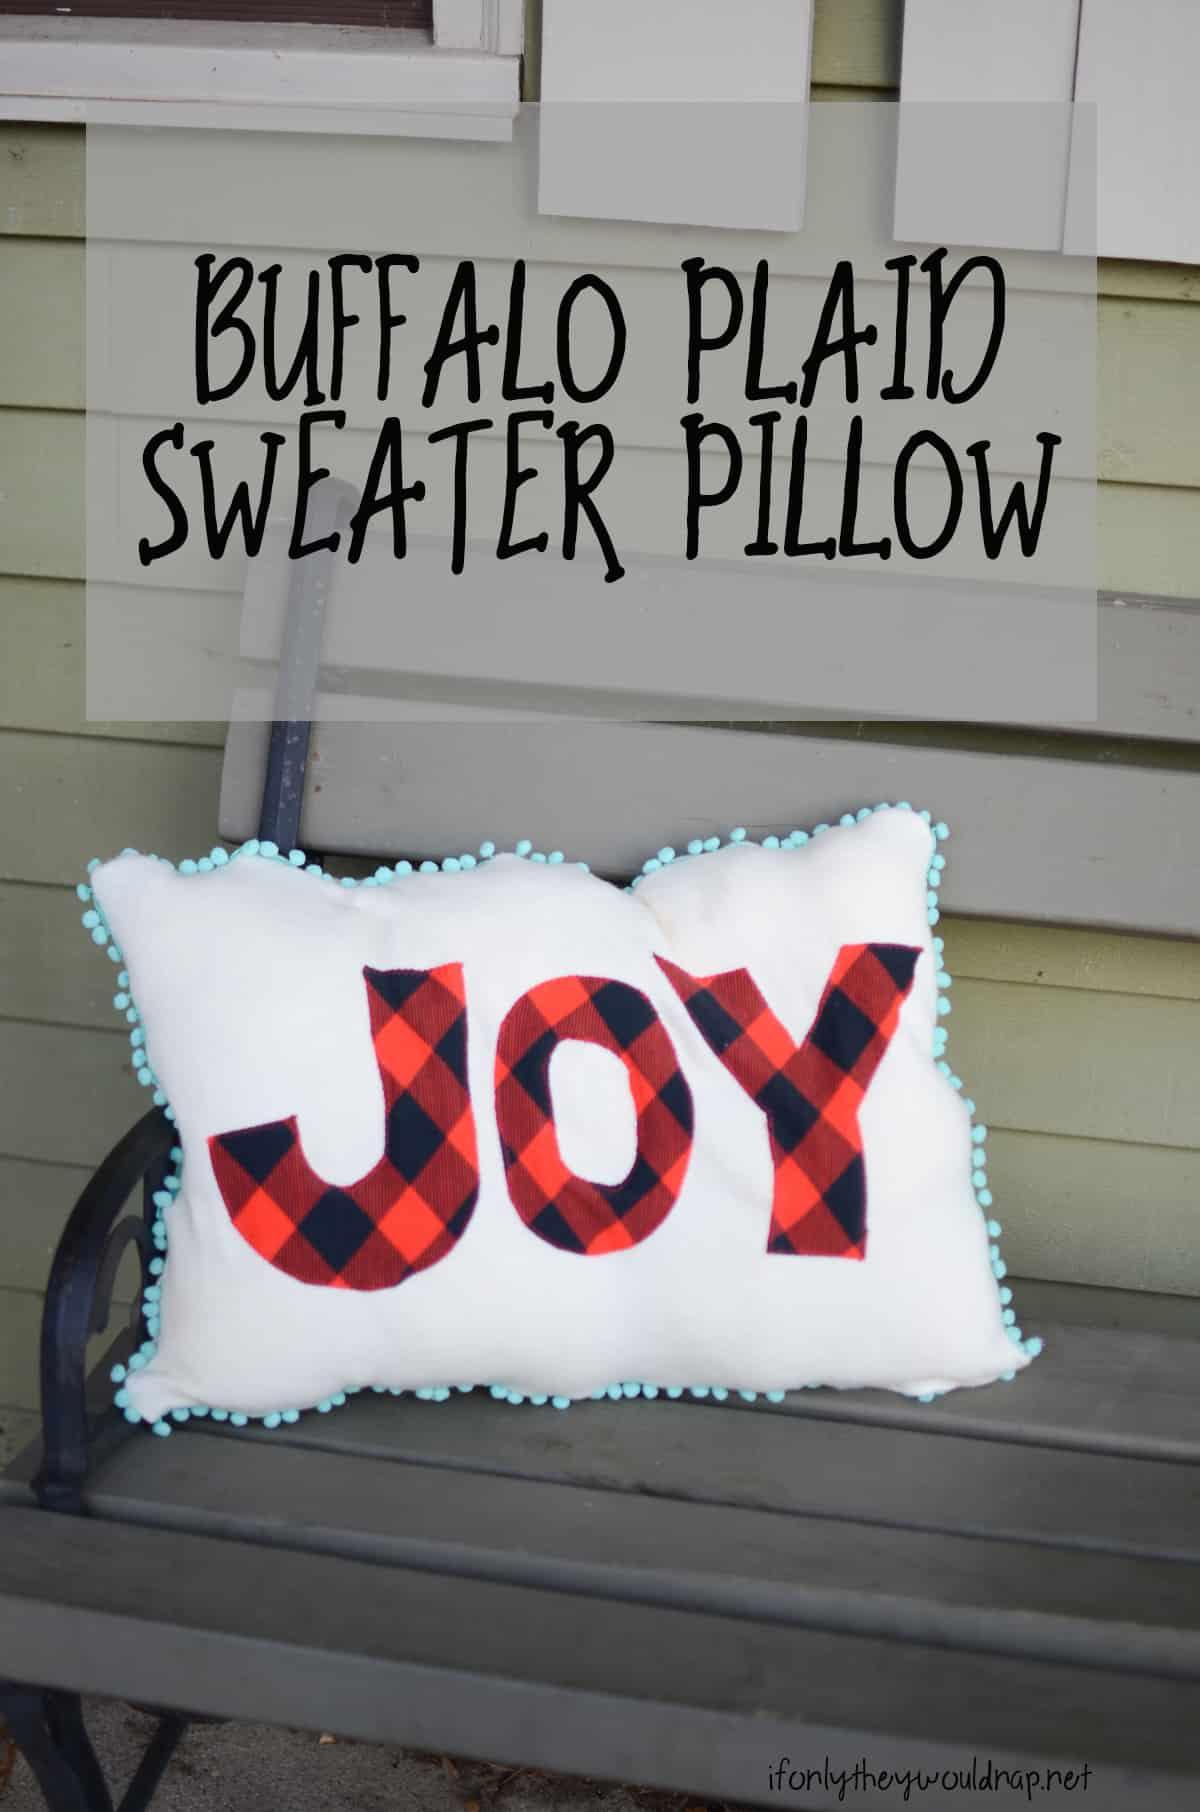 diy-buffalo-plaid-sweater-pillow